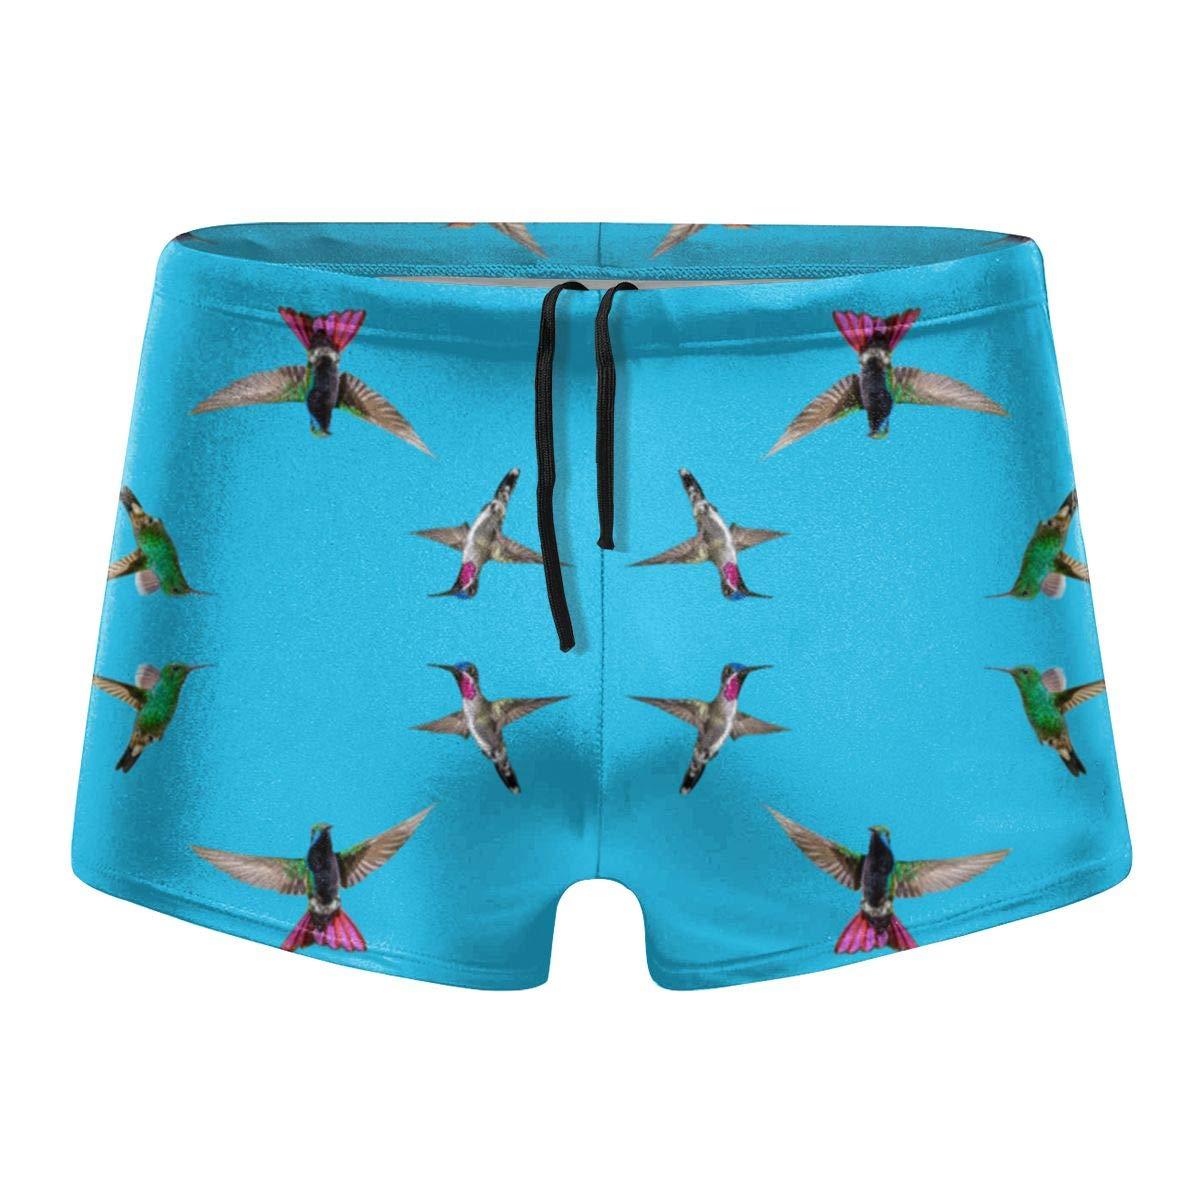 349tg1u Hummingbirds of T and T Tobago Blue Giftwrap Mens Swim Trunks Shorts Athletic Swimwear Briefs Boardshorts